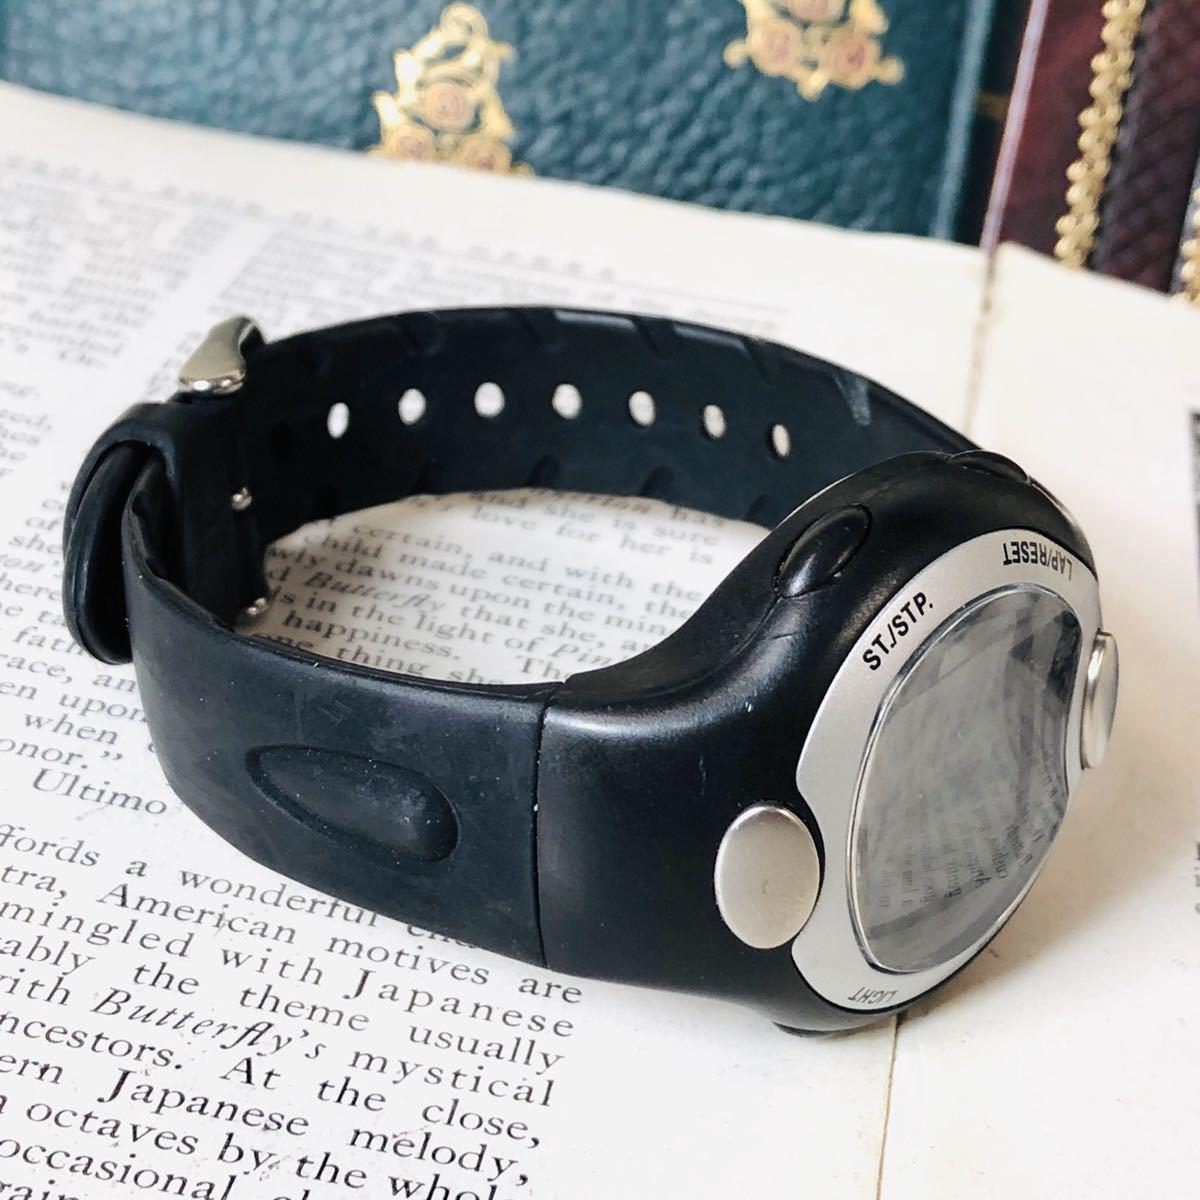 Reebok リーボック 腕時計 マットサテンシルバーカラー ブラック 心拍計 クロノ タイマー デジタル 稼動品 W730_画像3